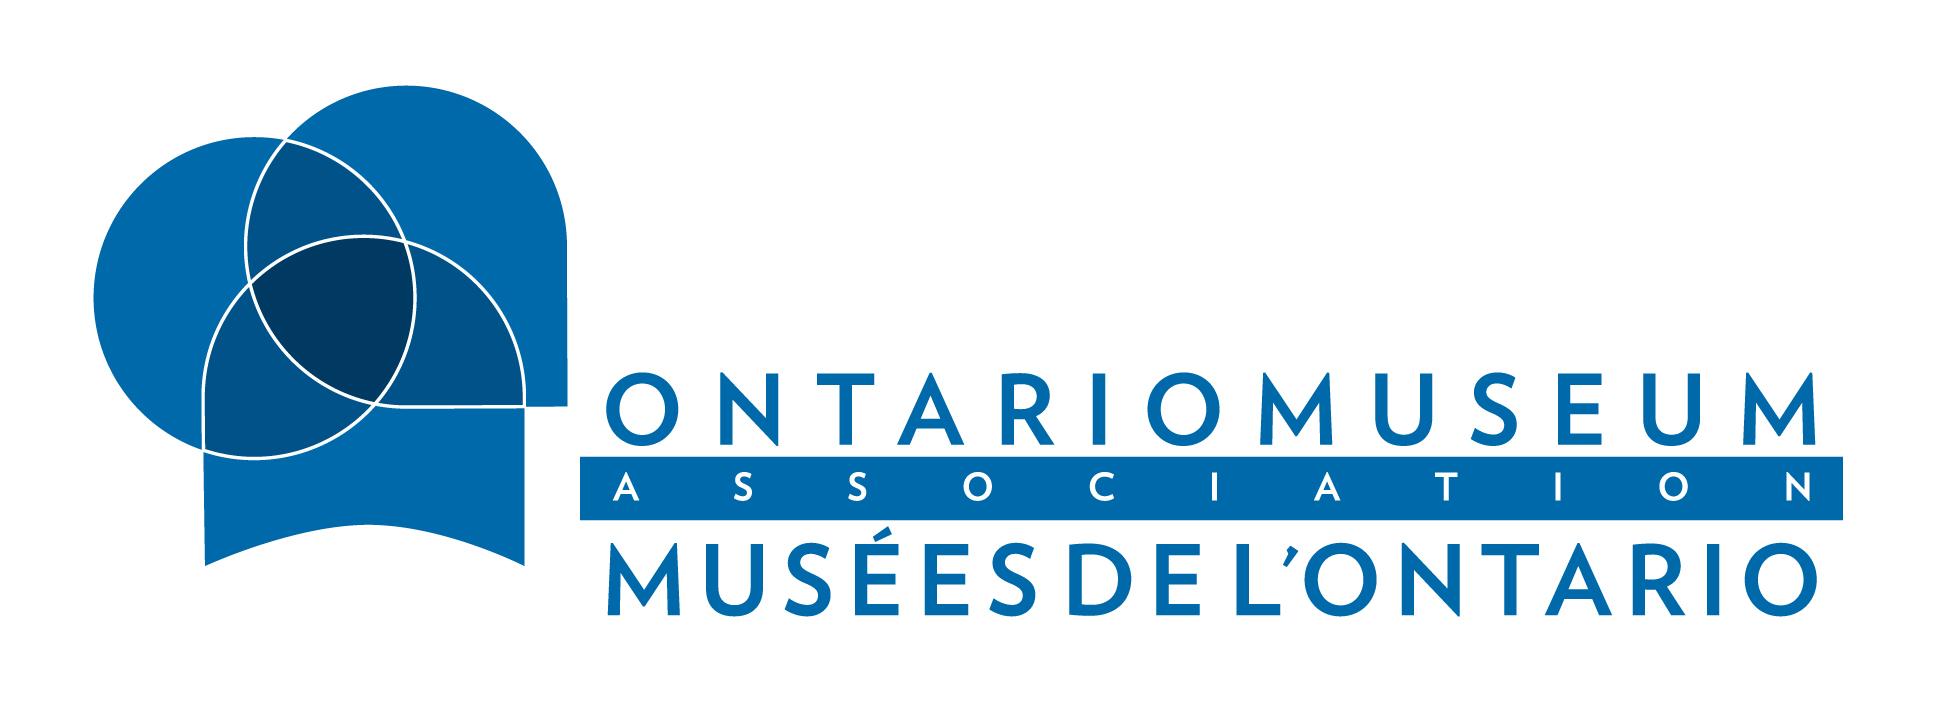 Ontario Museum Association Announces Awards of Excellence 2020 Recipients